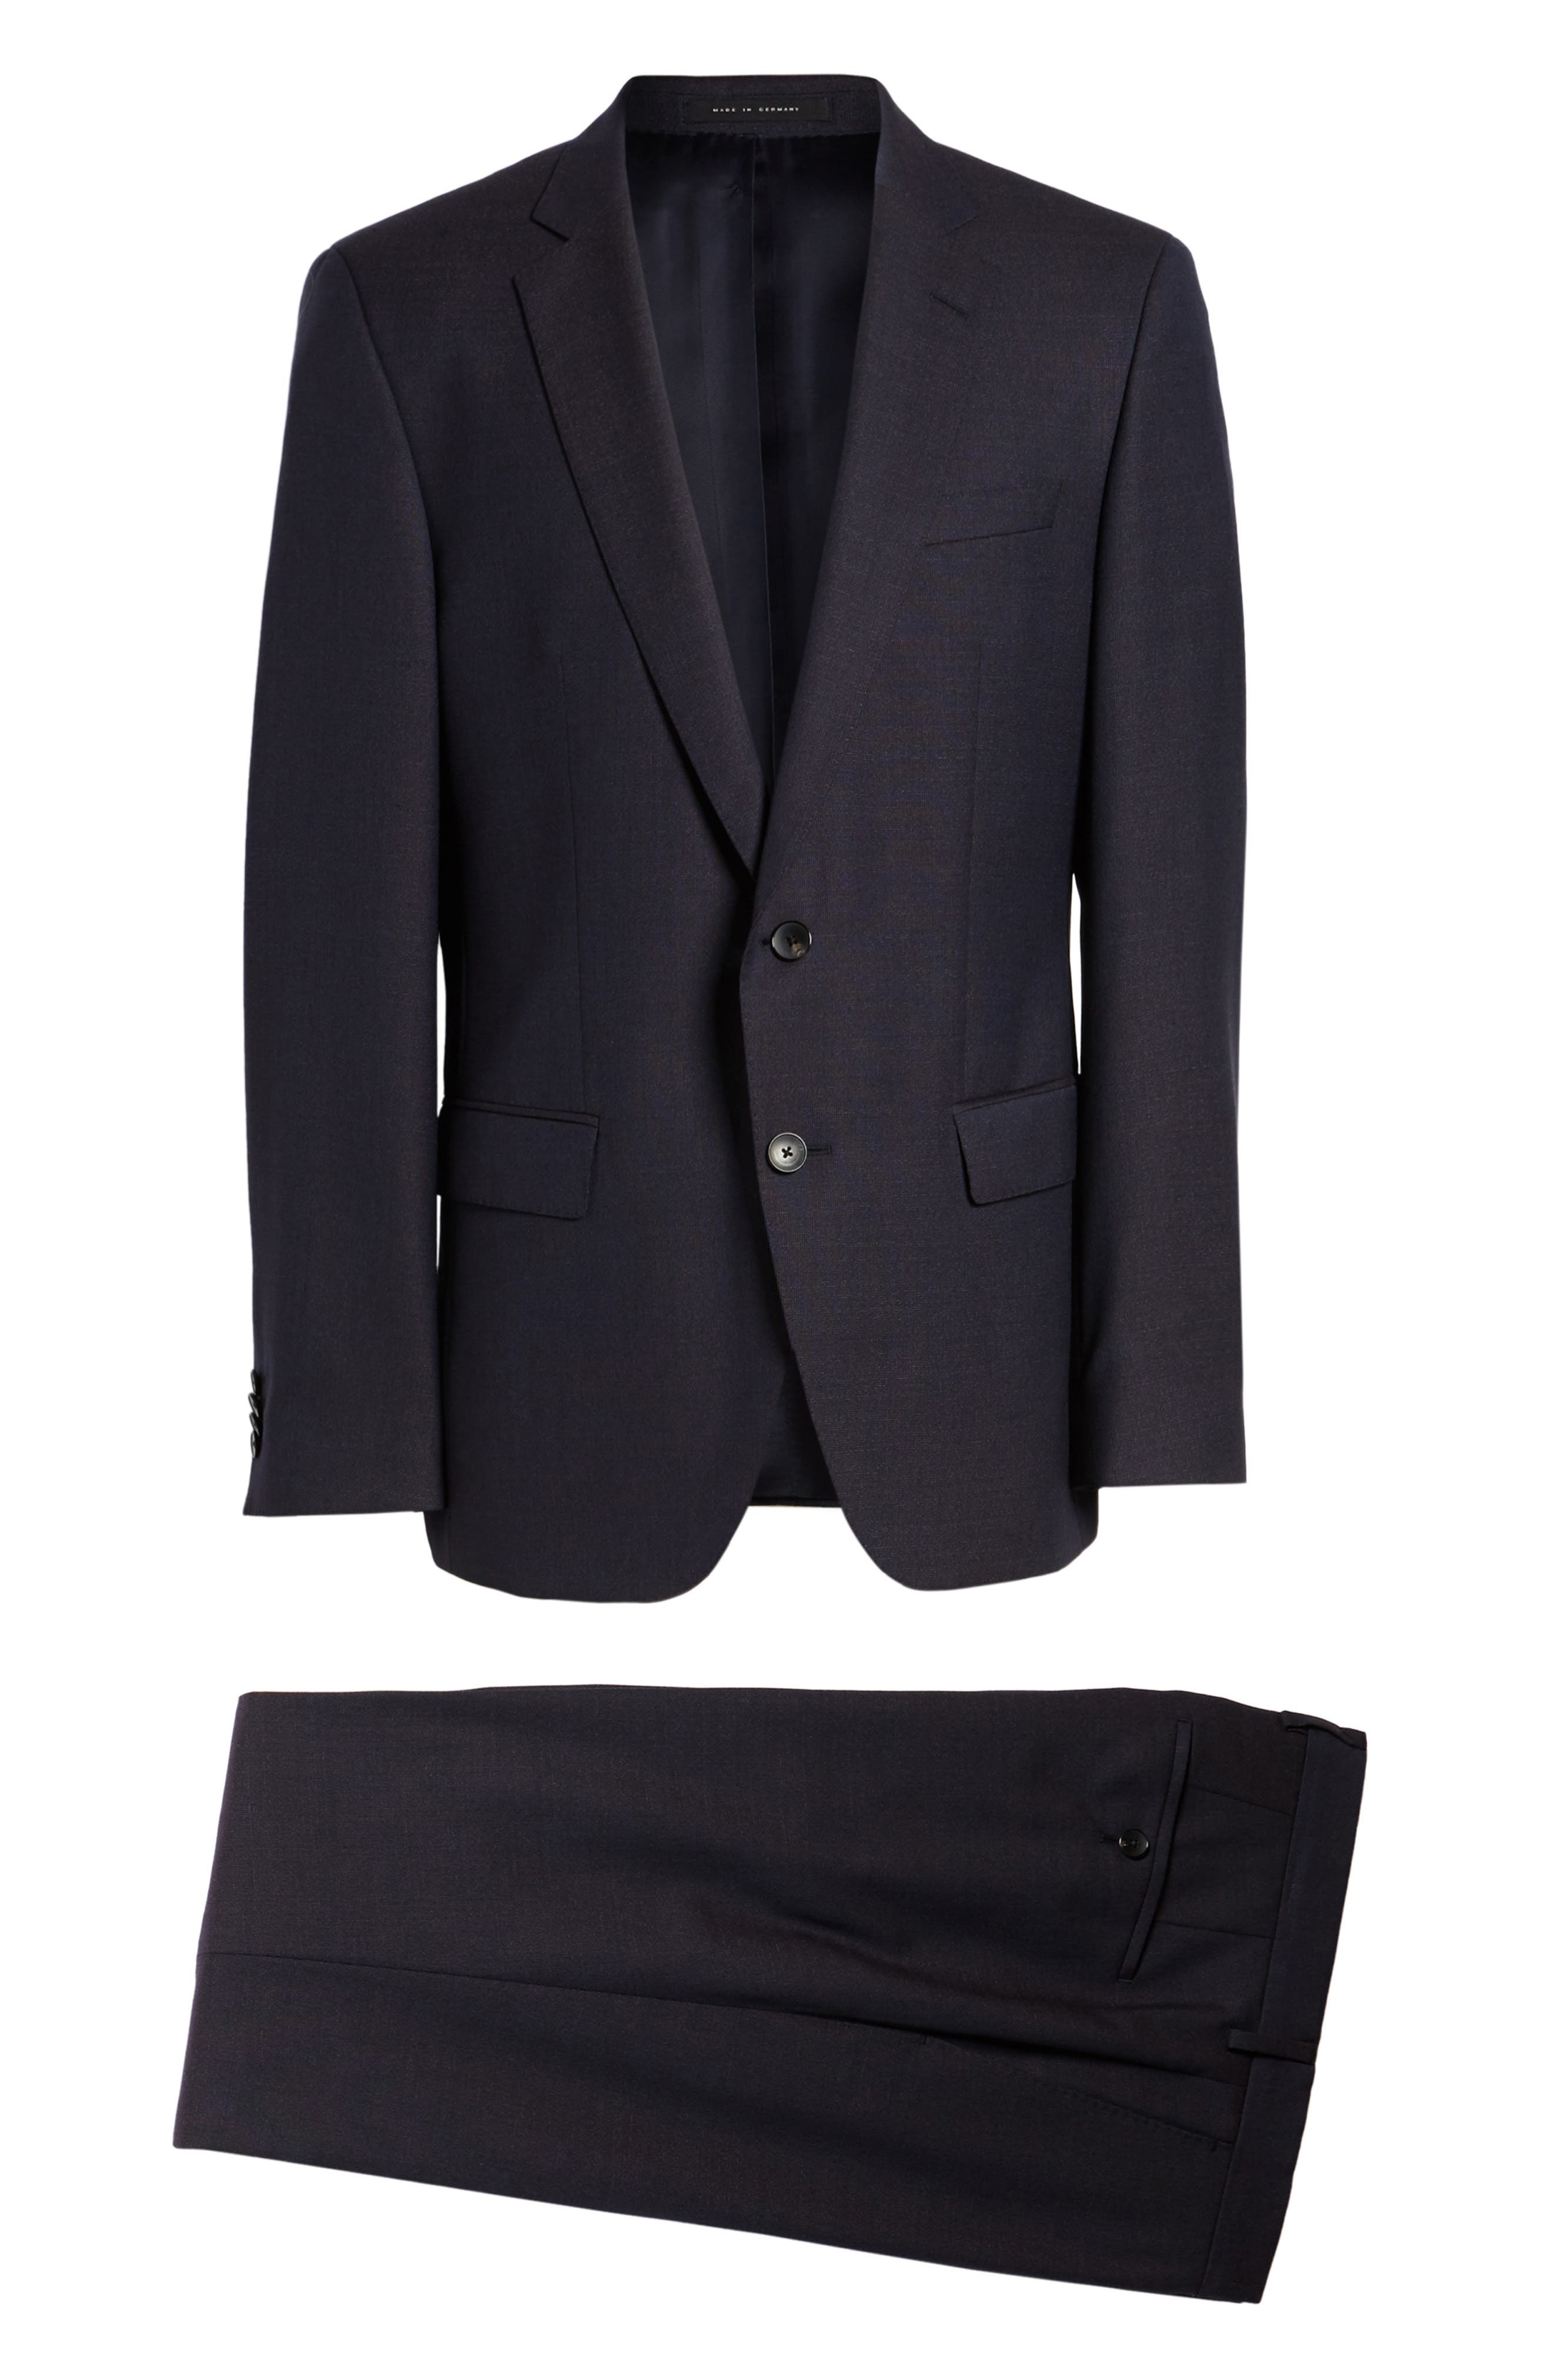 Huge/Genius Trim Fit Wool Suit,                             Alternate thumbnail 8, color,                             606